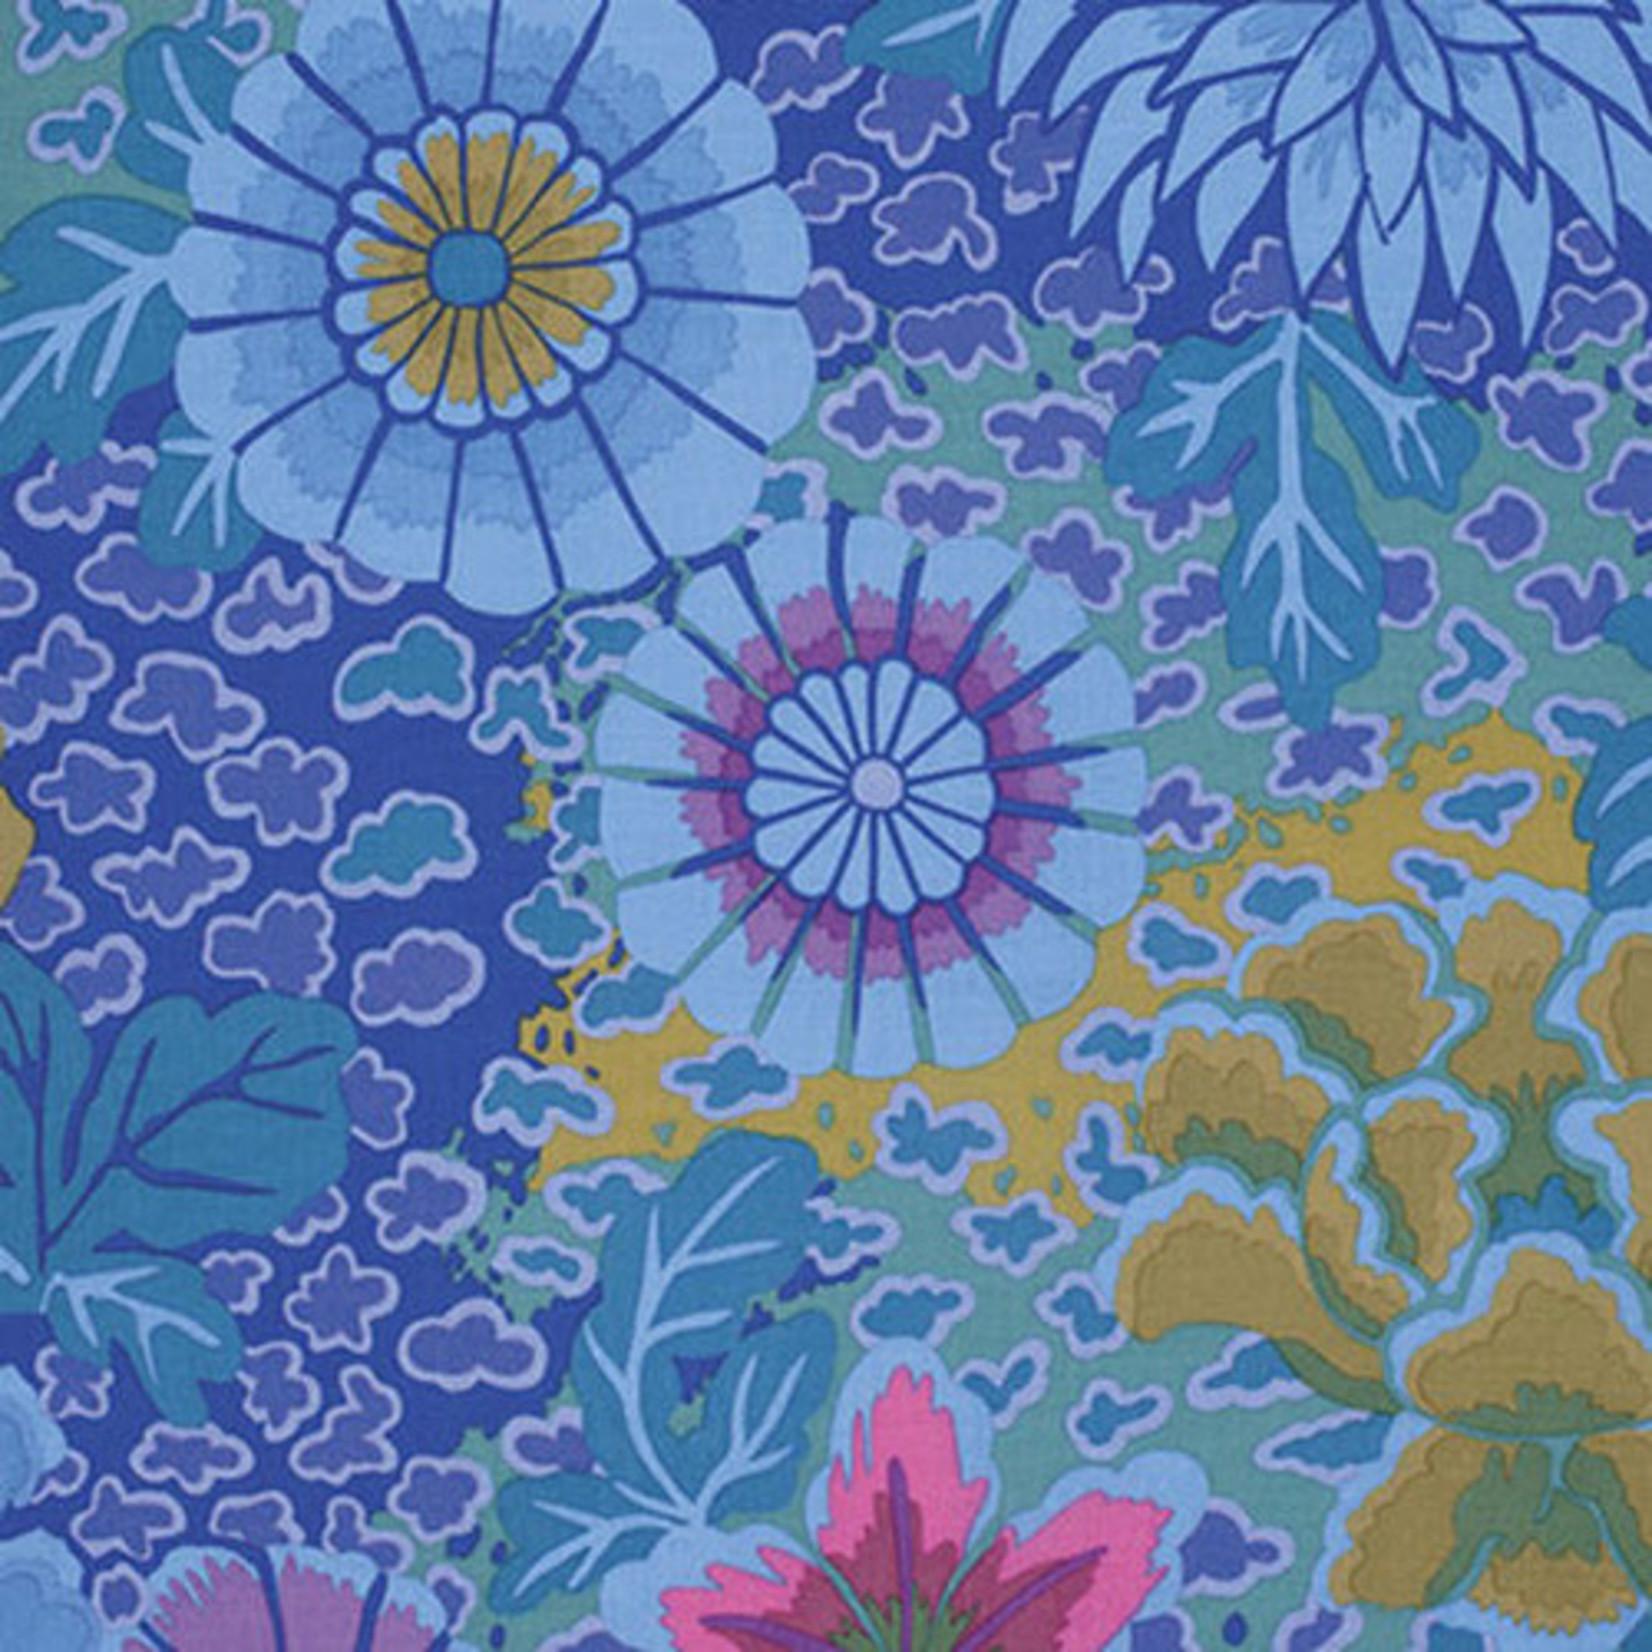 Kaffe Fassett KF Collective - Dream, Blue (PWGP148.BLUEX) $0.18 per cm or $18/m